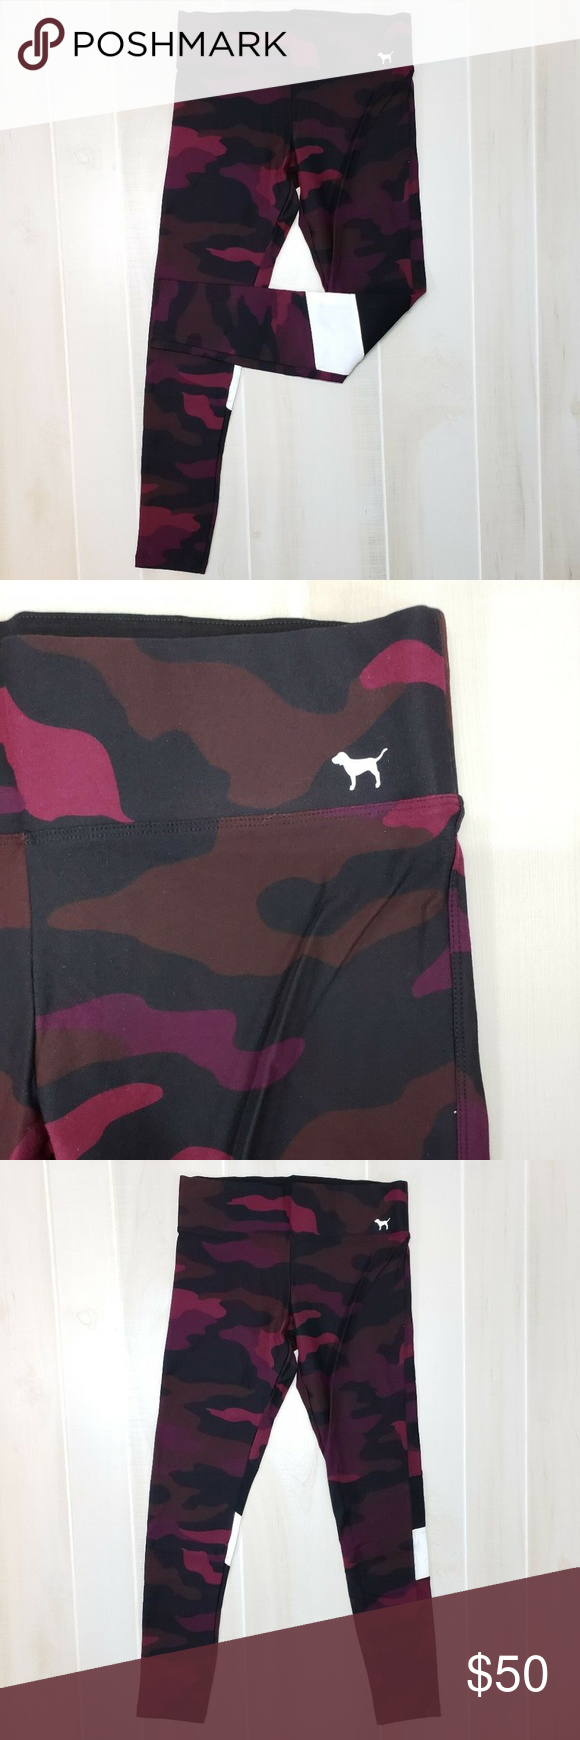 074c21d929 VS PINK Camo Leggings M ~ CF21 Victoria s Secret PINK Yoga Legging Pant  Red